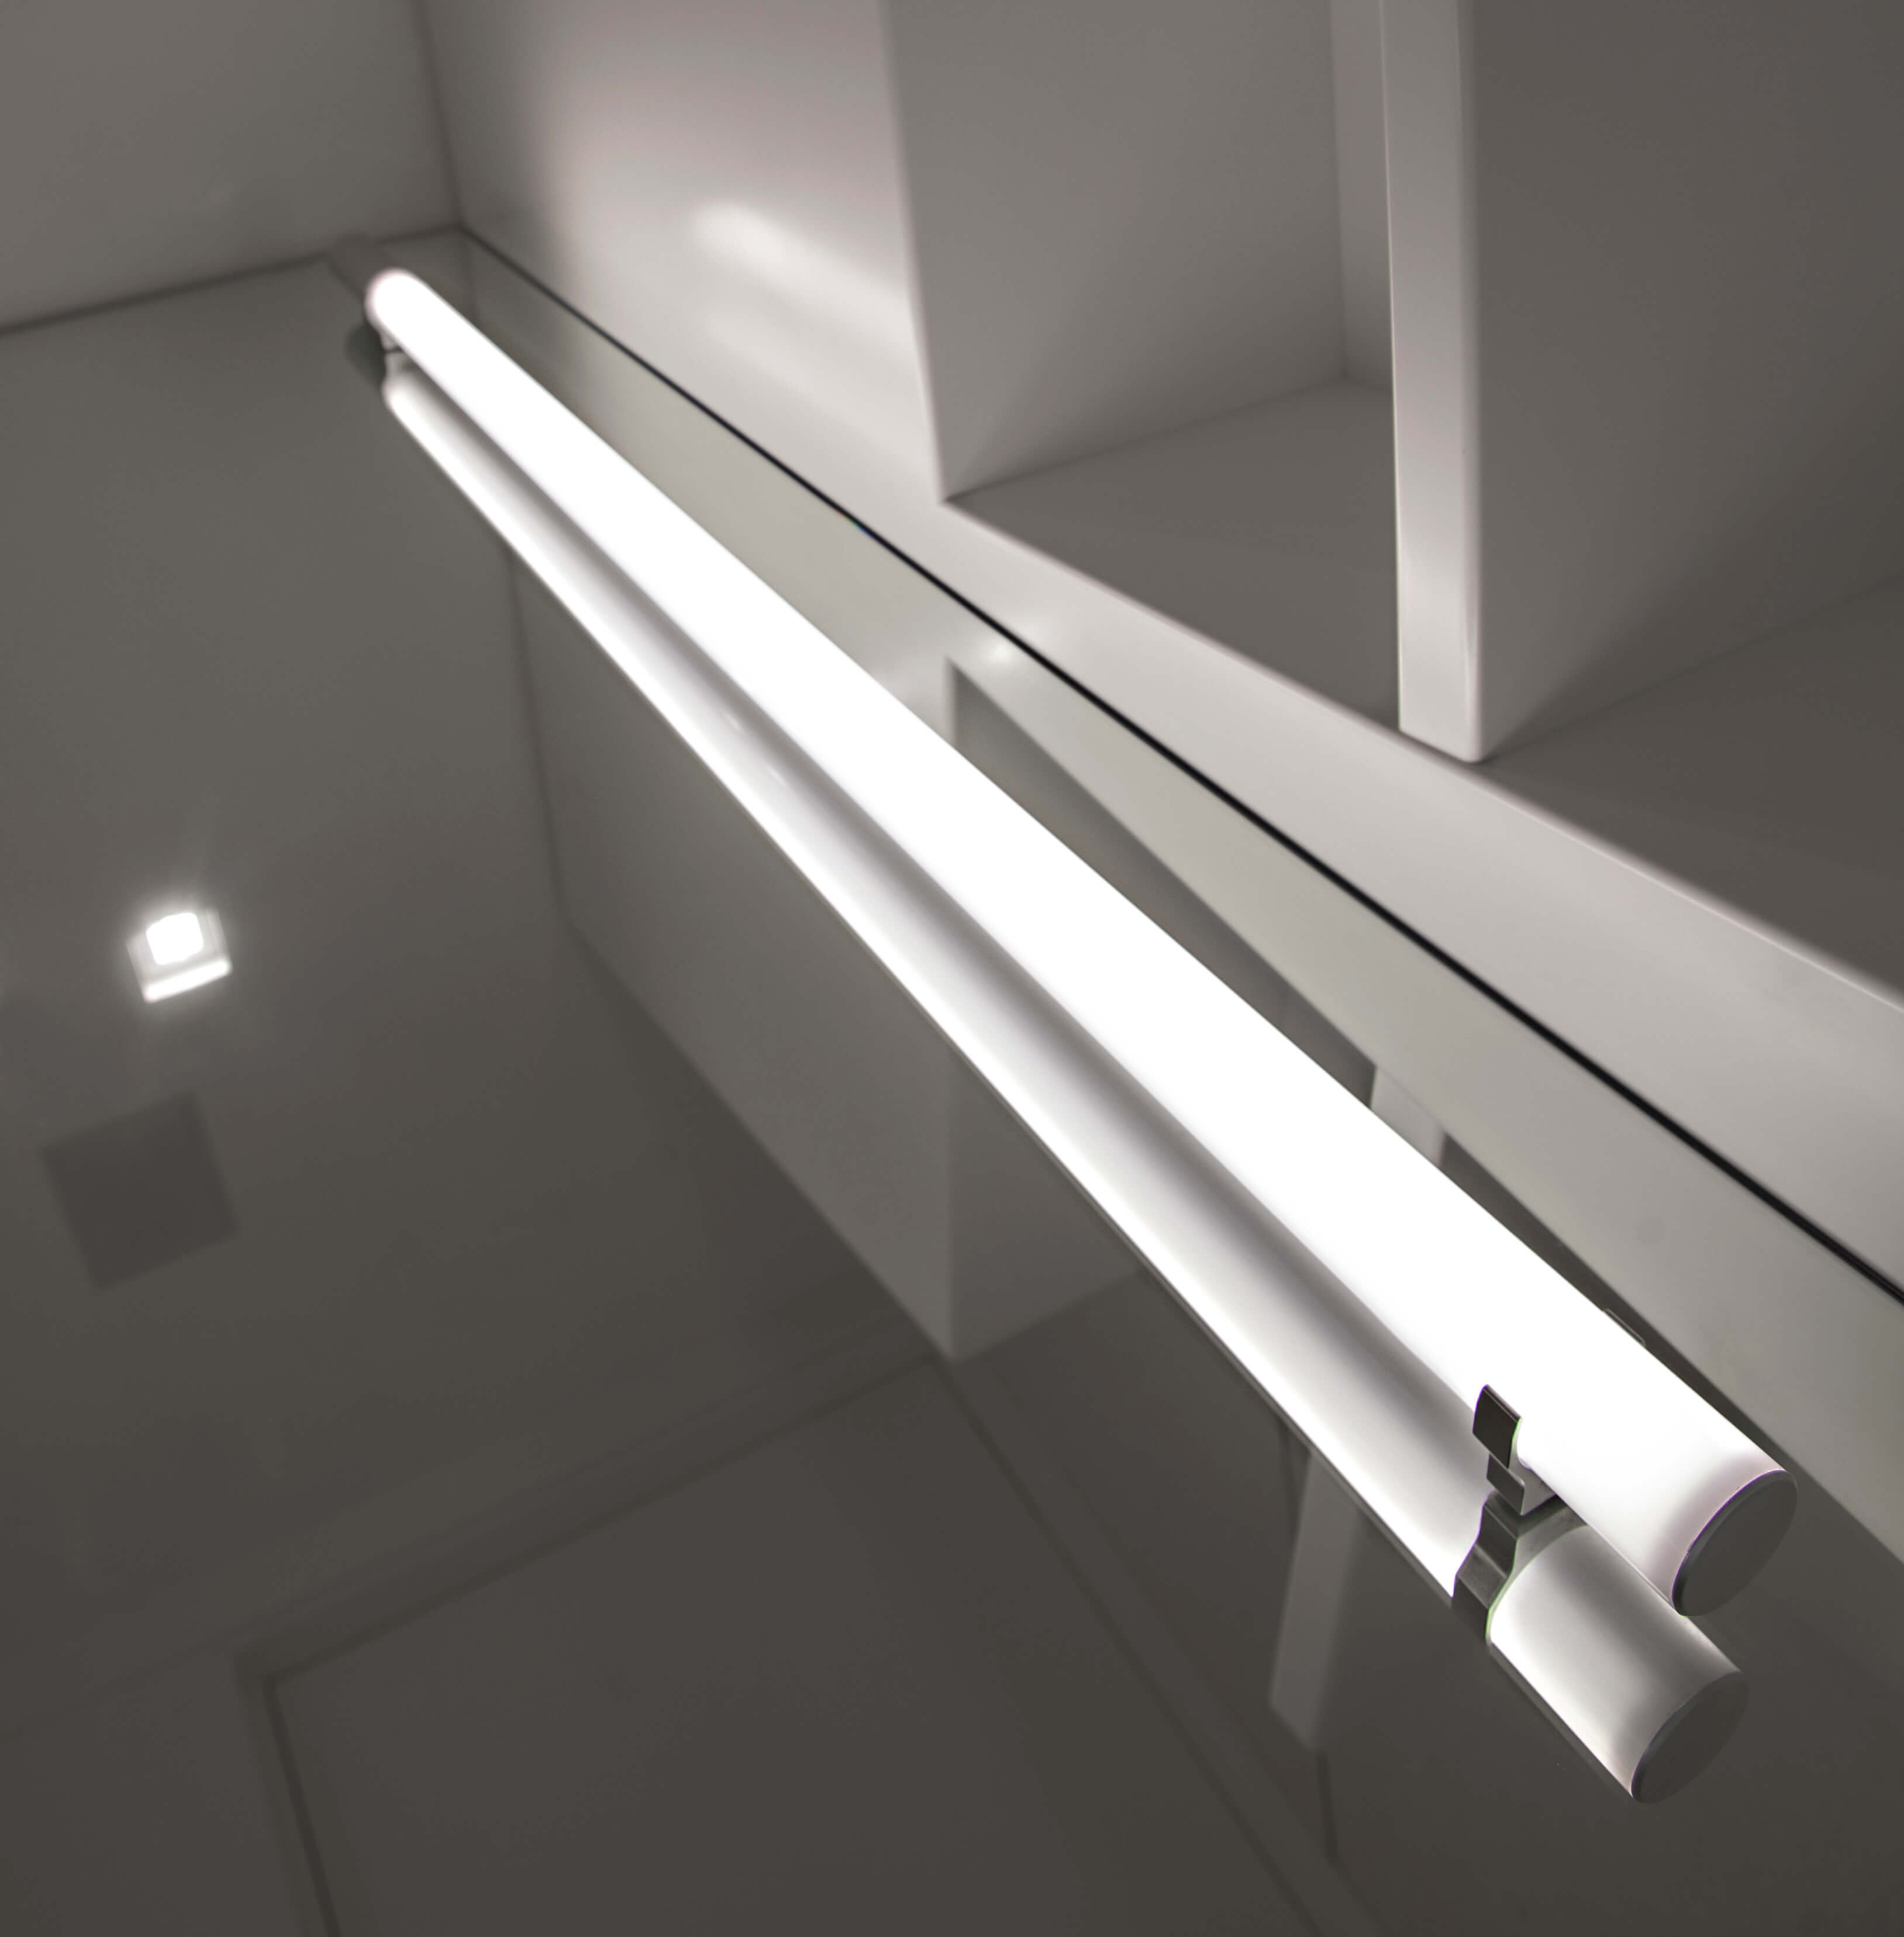 Lampade tubolari led zword di brillamenti for Lampada tubolare led